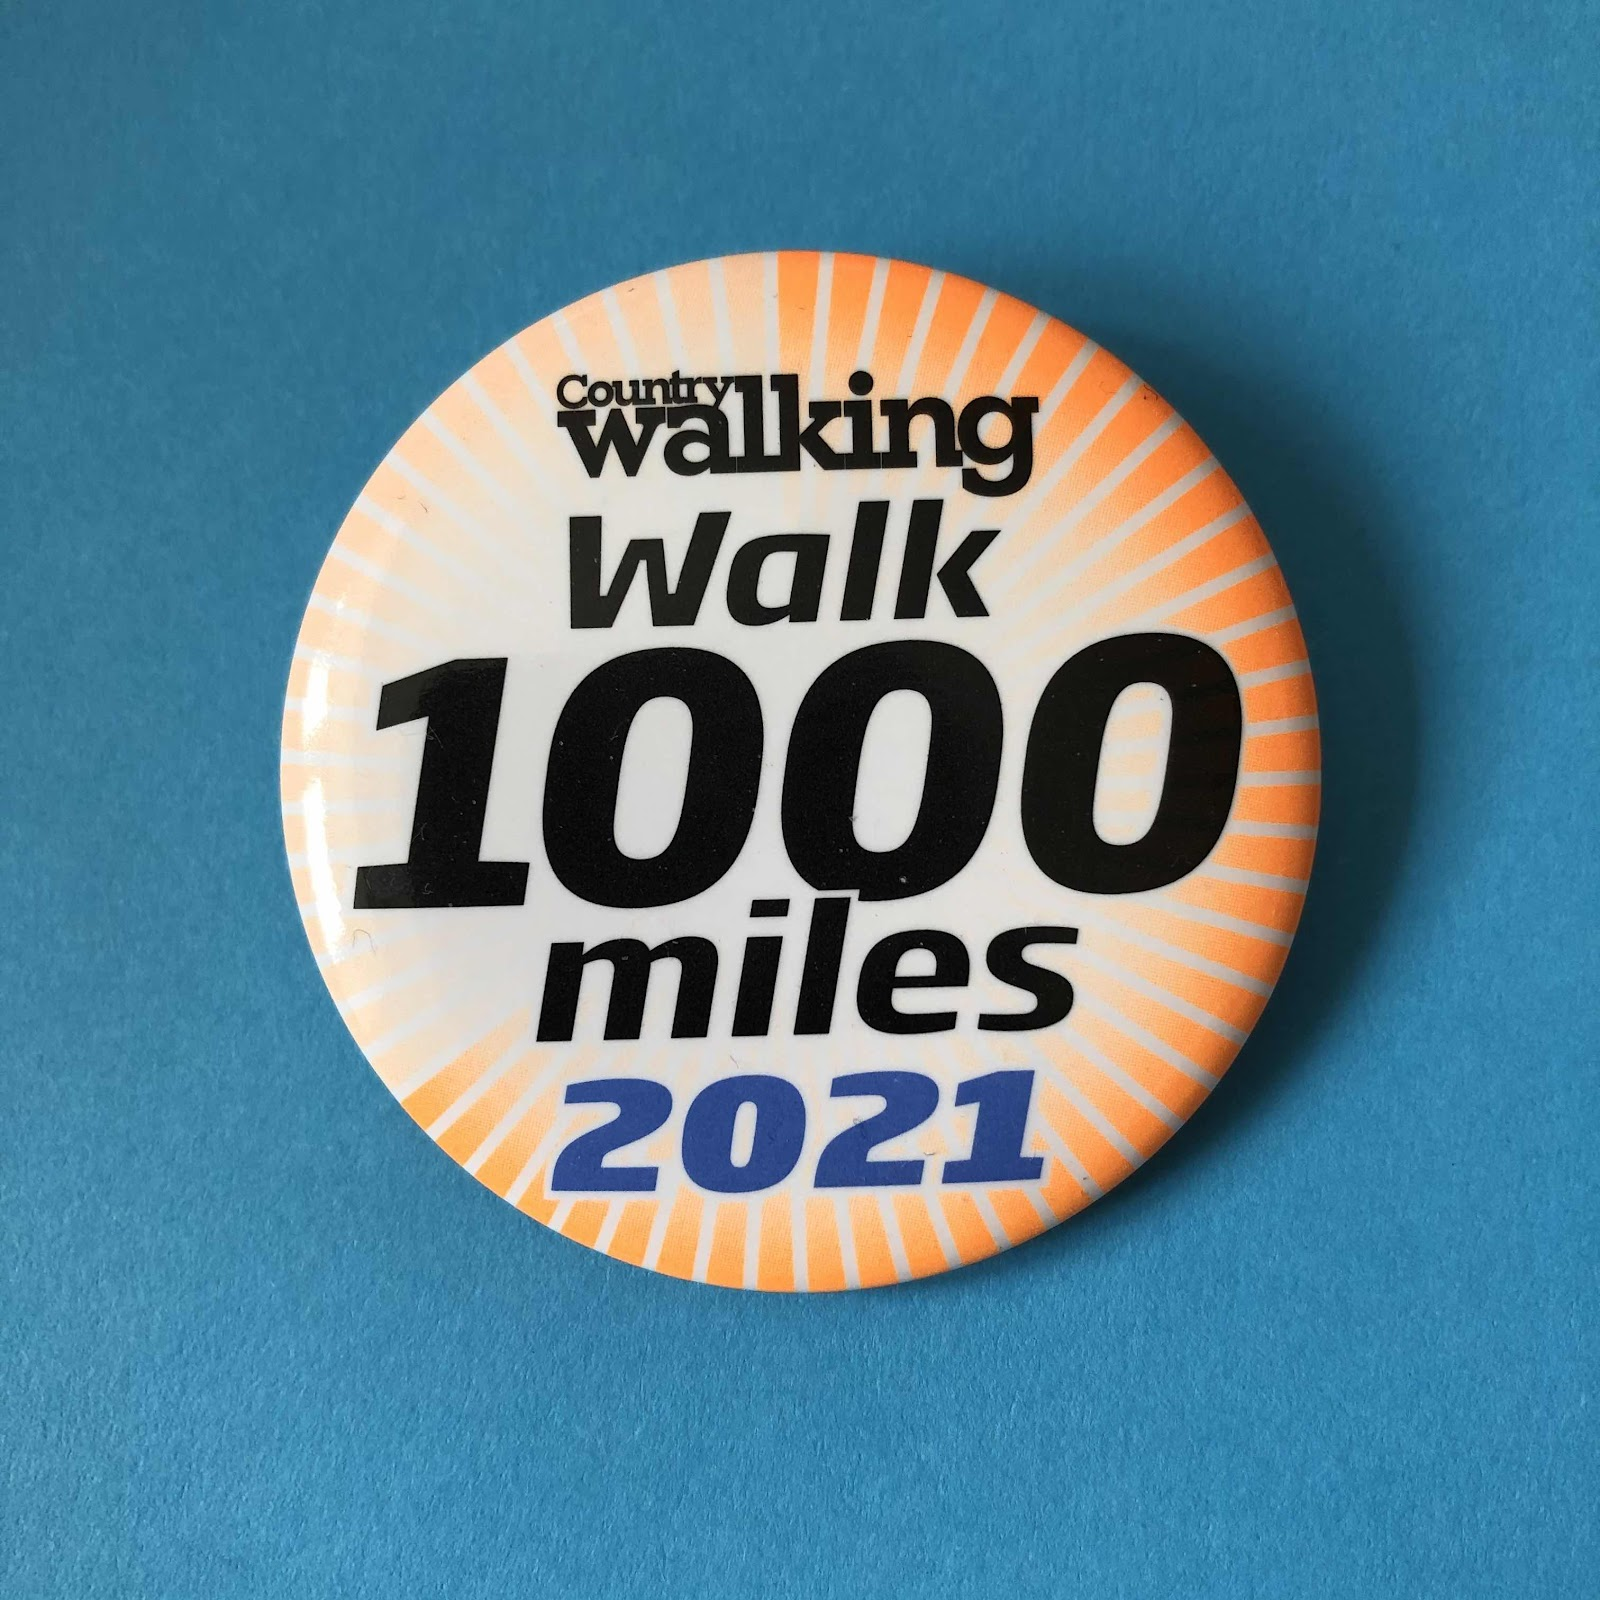 orange pin badge with Country Walking Walk 1000 miles written on it